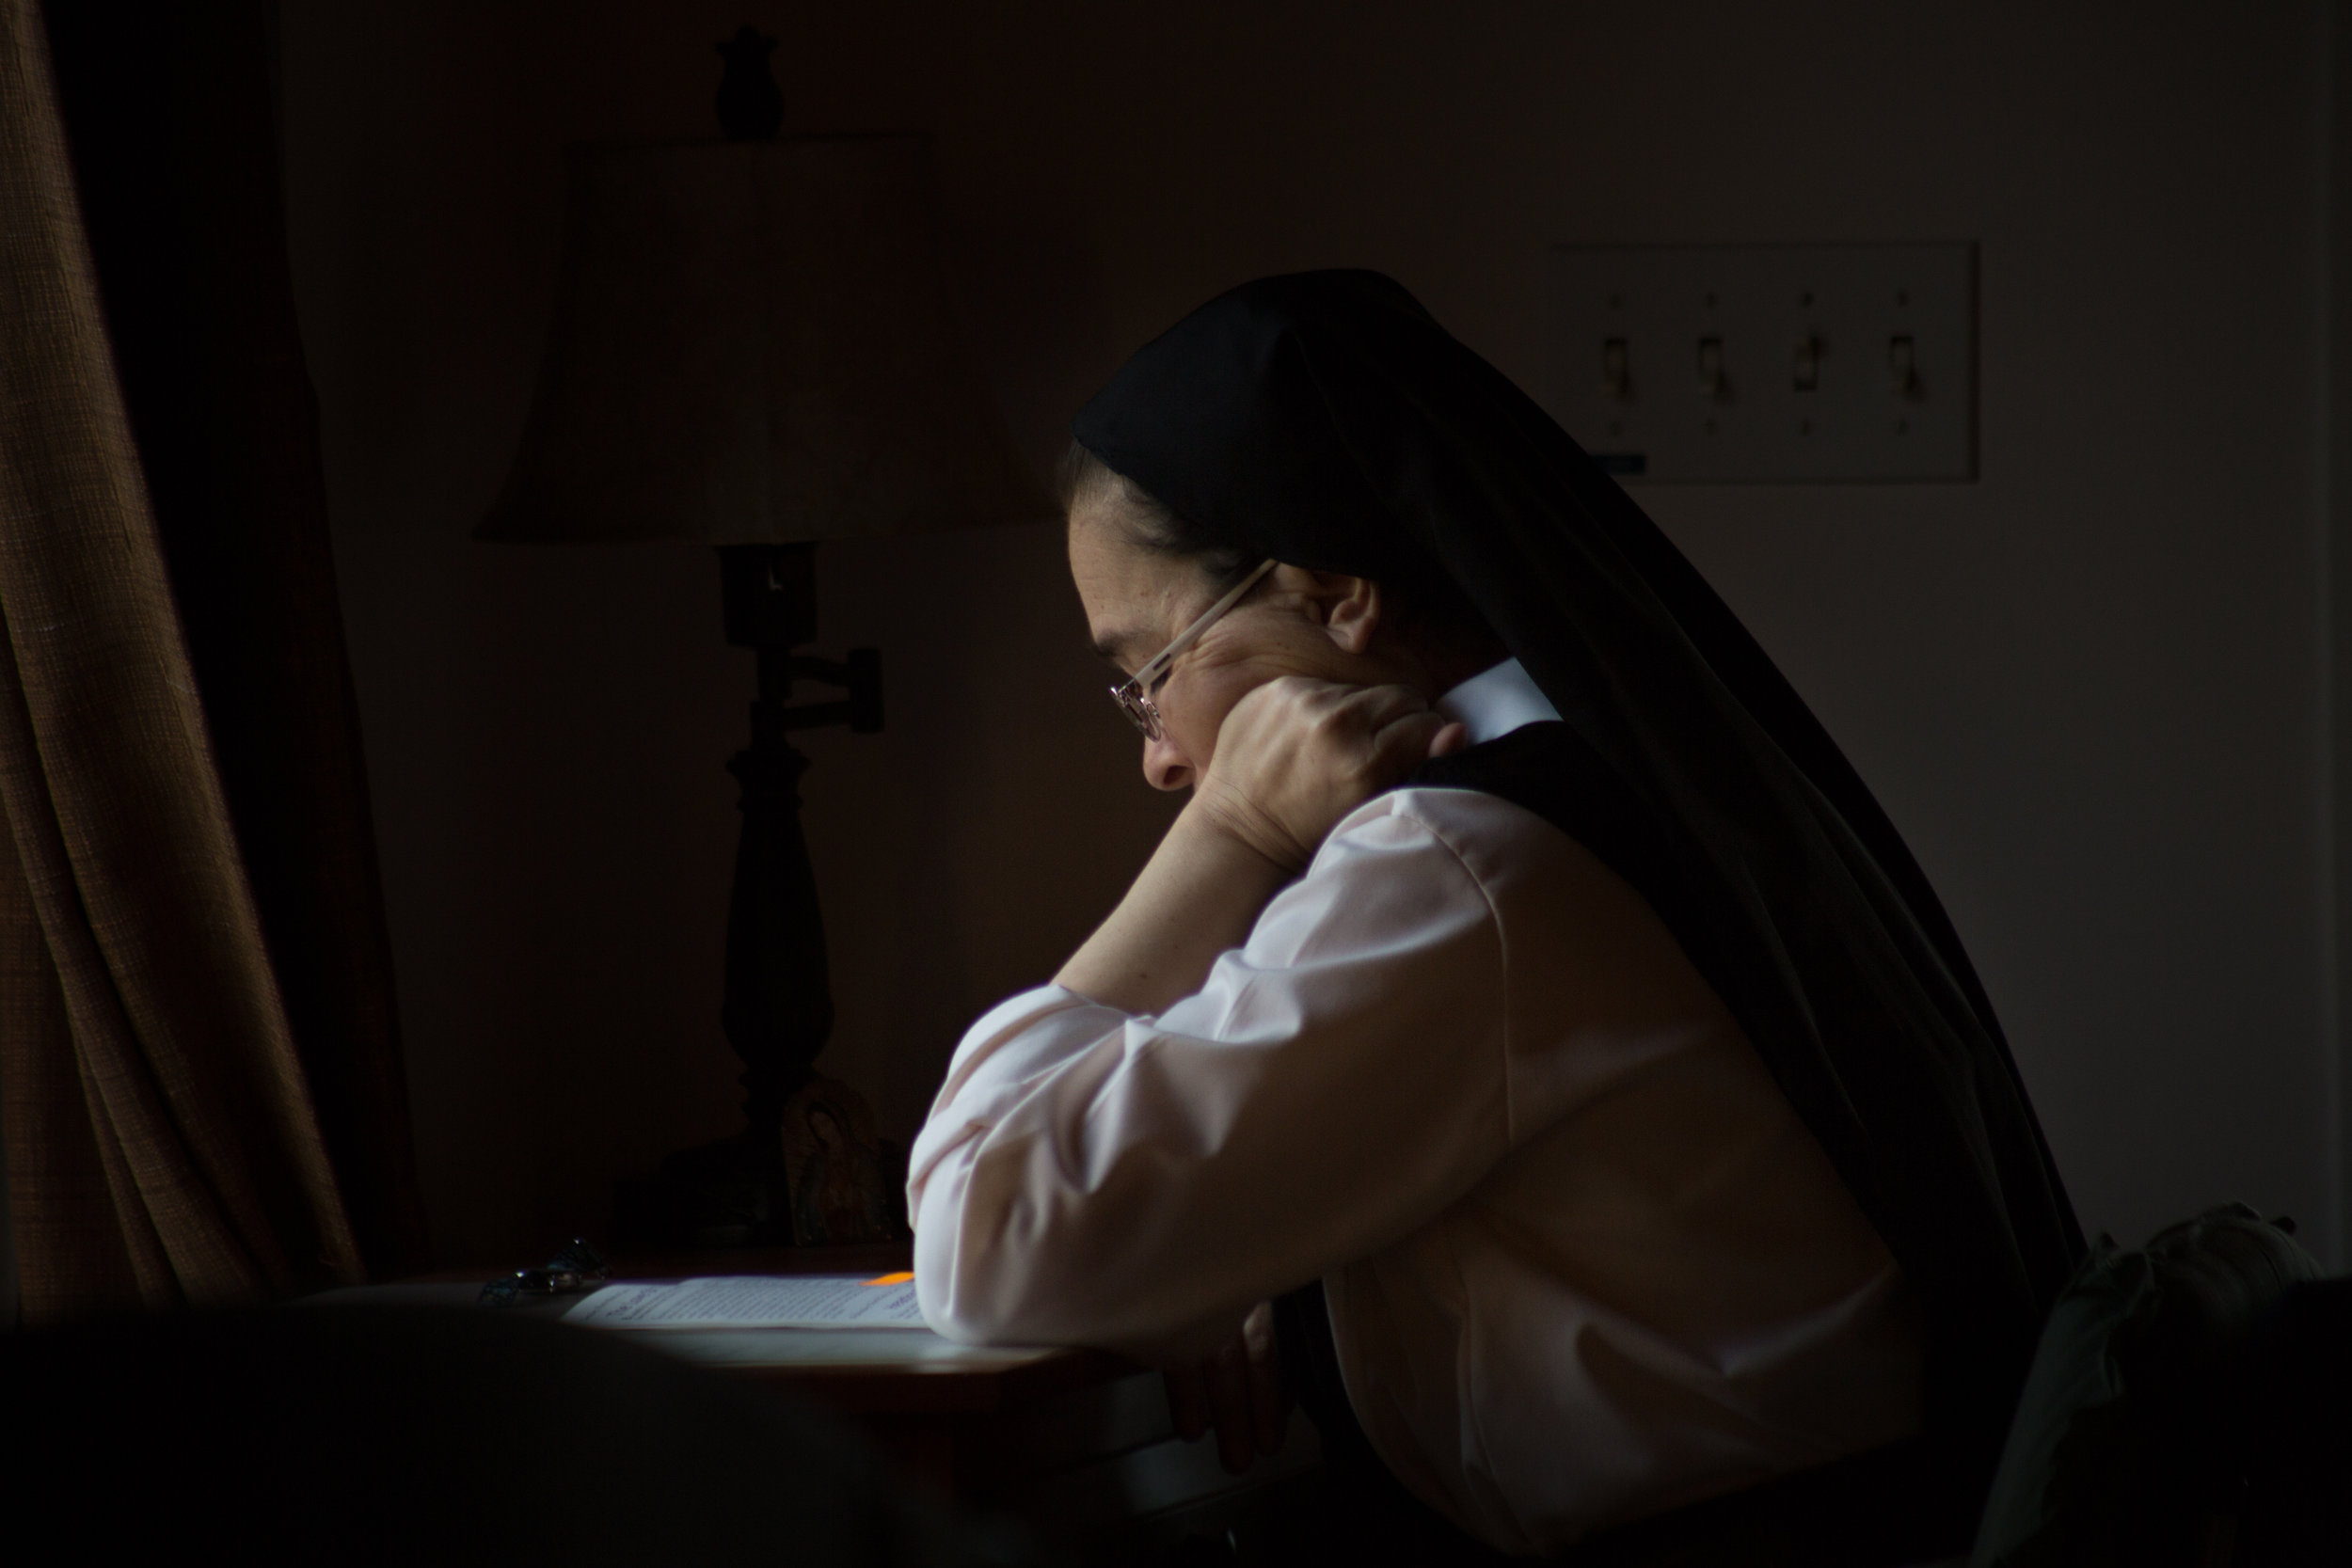 Sister Jacqueline mediates during evening vespers March 30, 2019 in Crozet, Virginia.